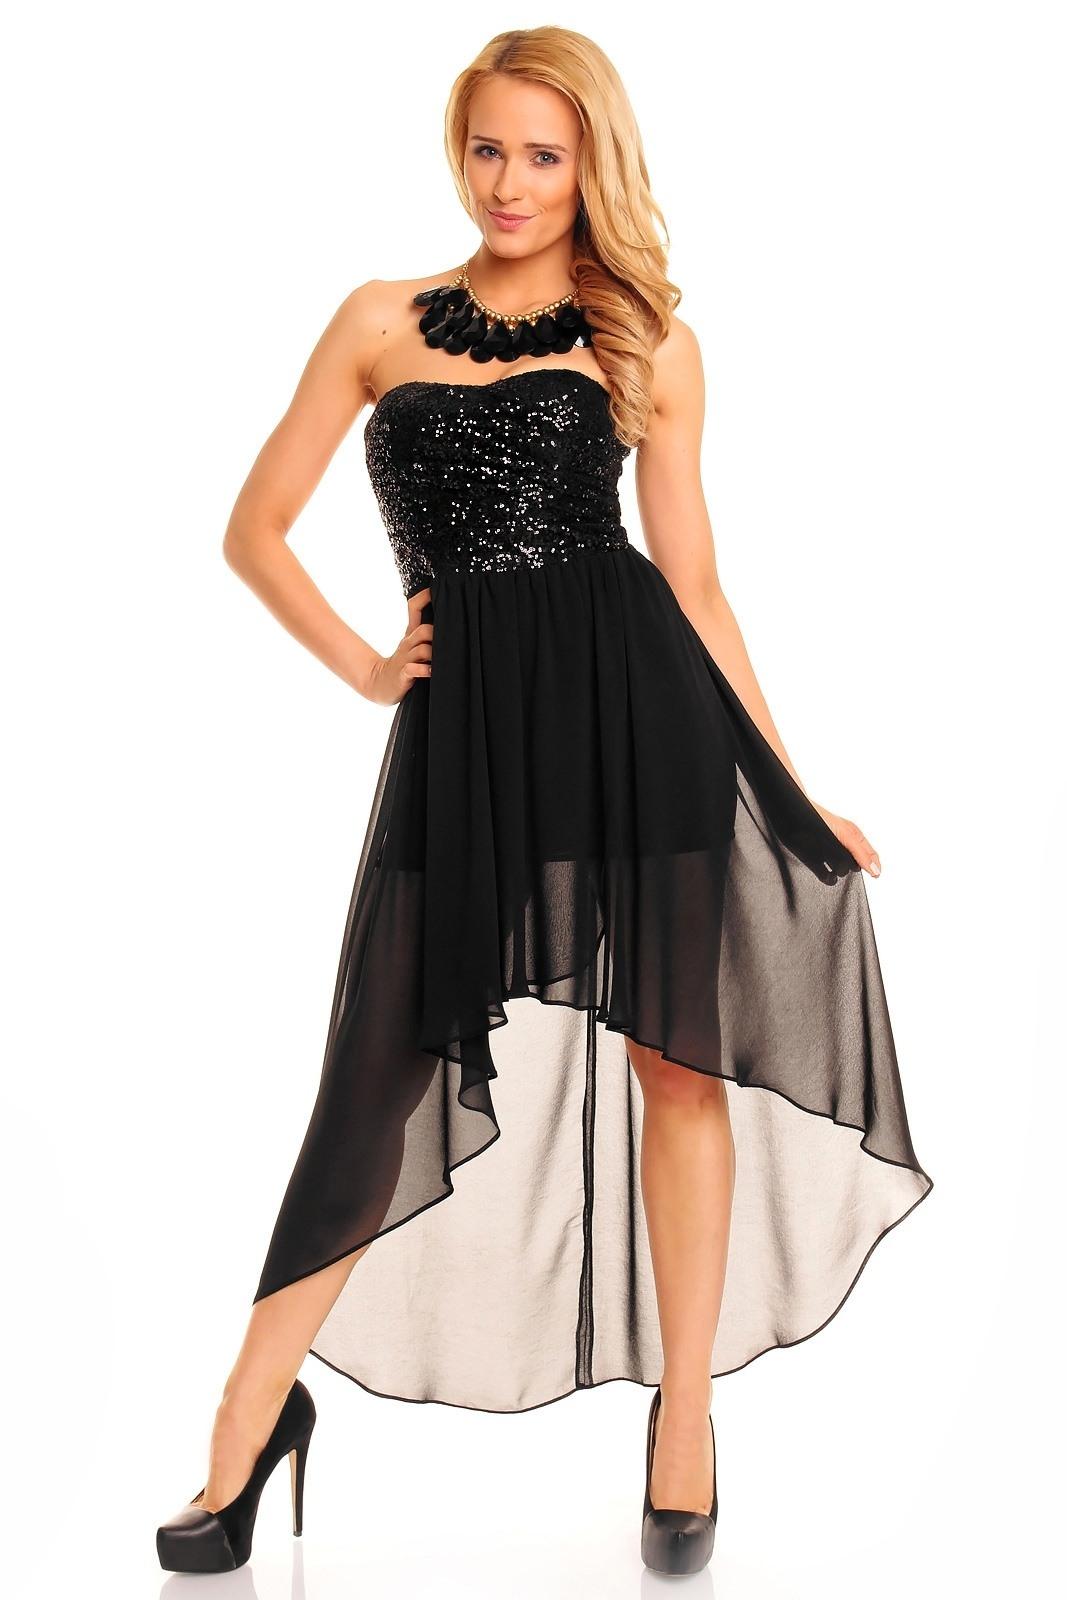 Genial Abendkleider Lang Junge Mode Boutique13 Cool Abendkleider Lang Junge Mode Vertrieb